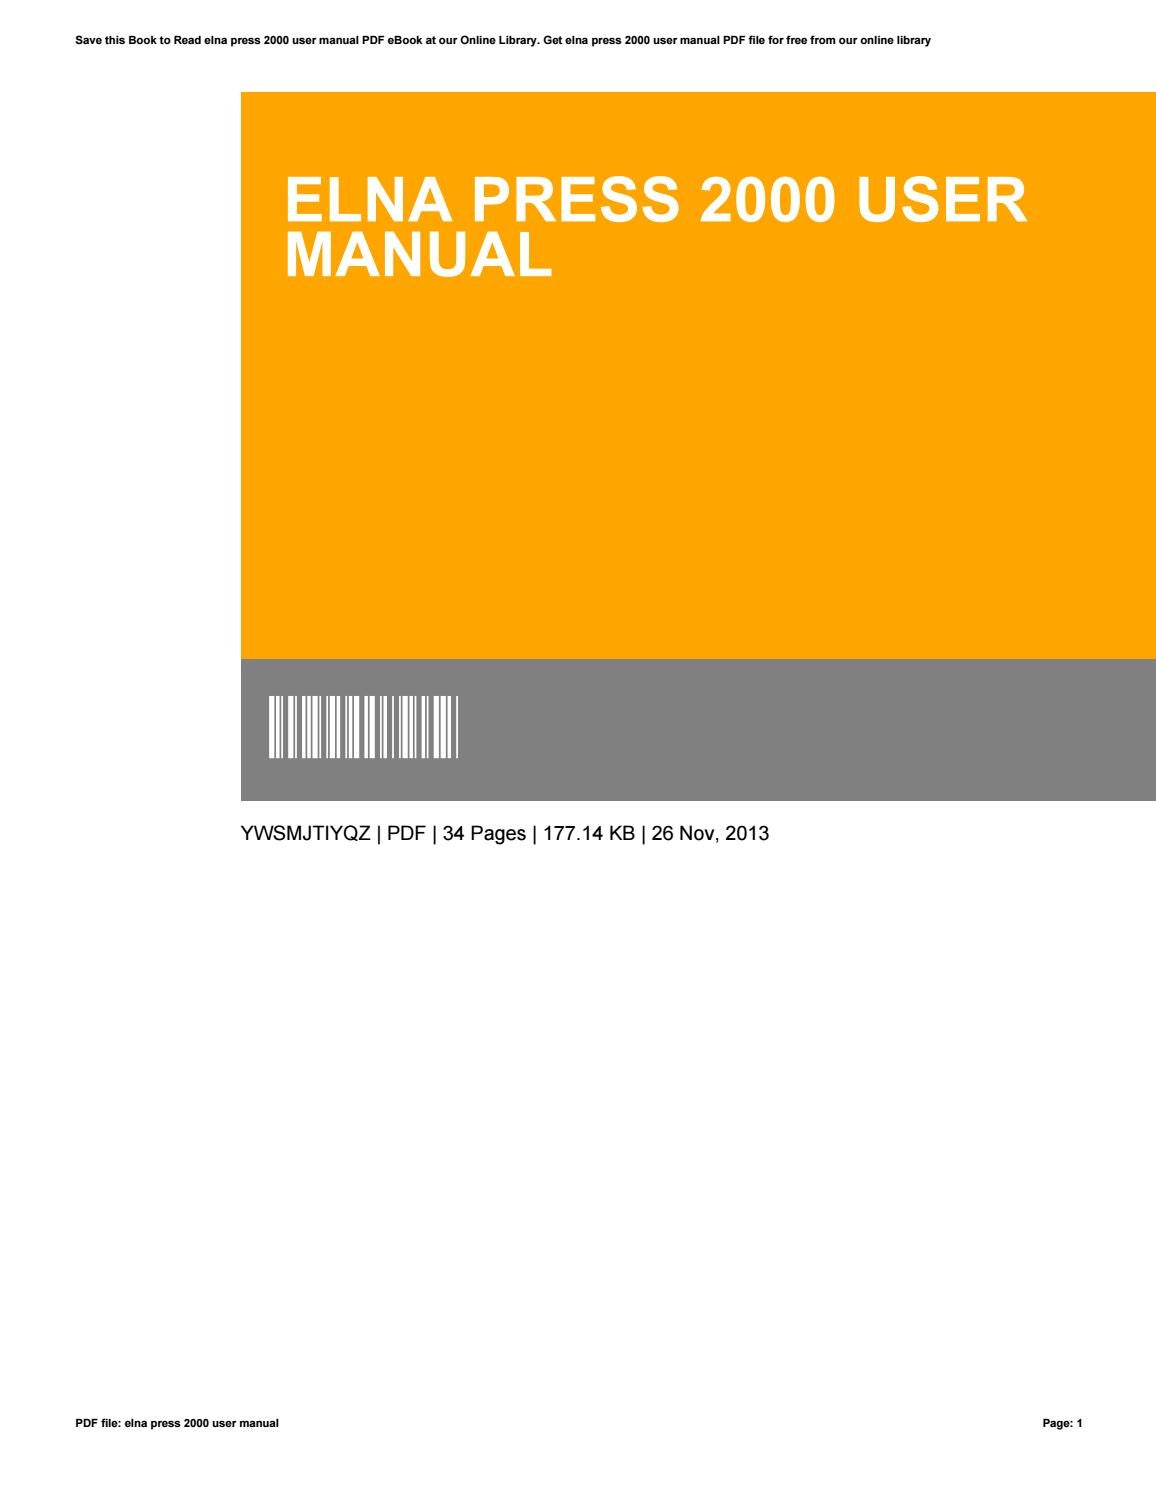 ... Array - elna press 2000 user manual by patriciadenny4451 issuu rh issuu  ...